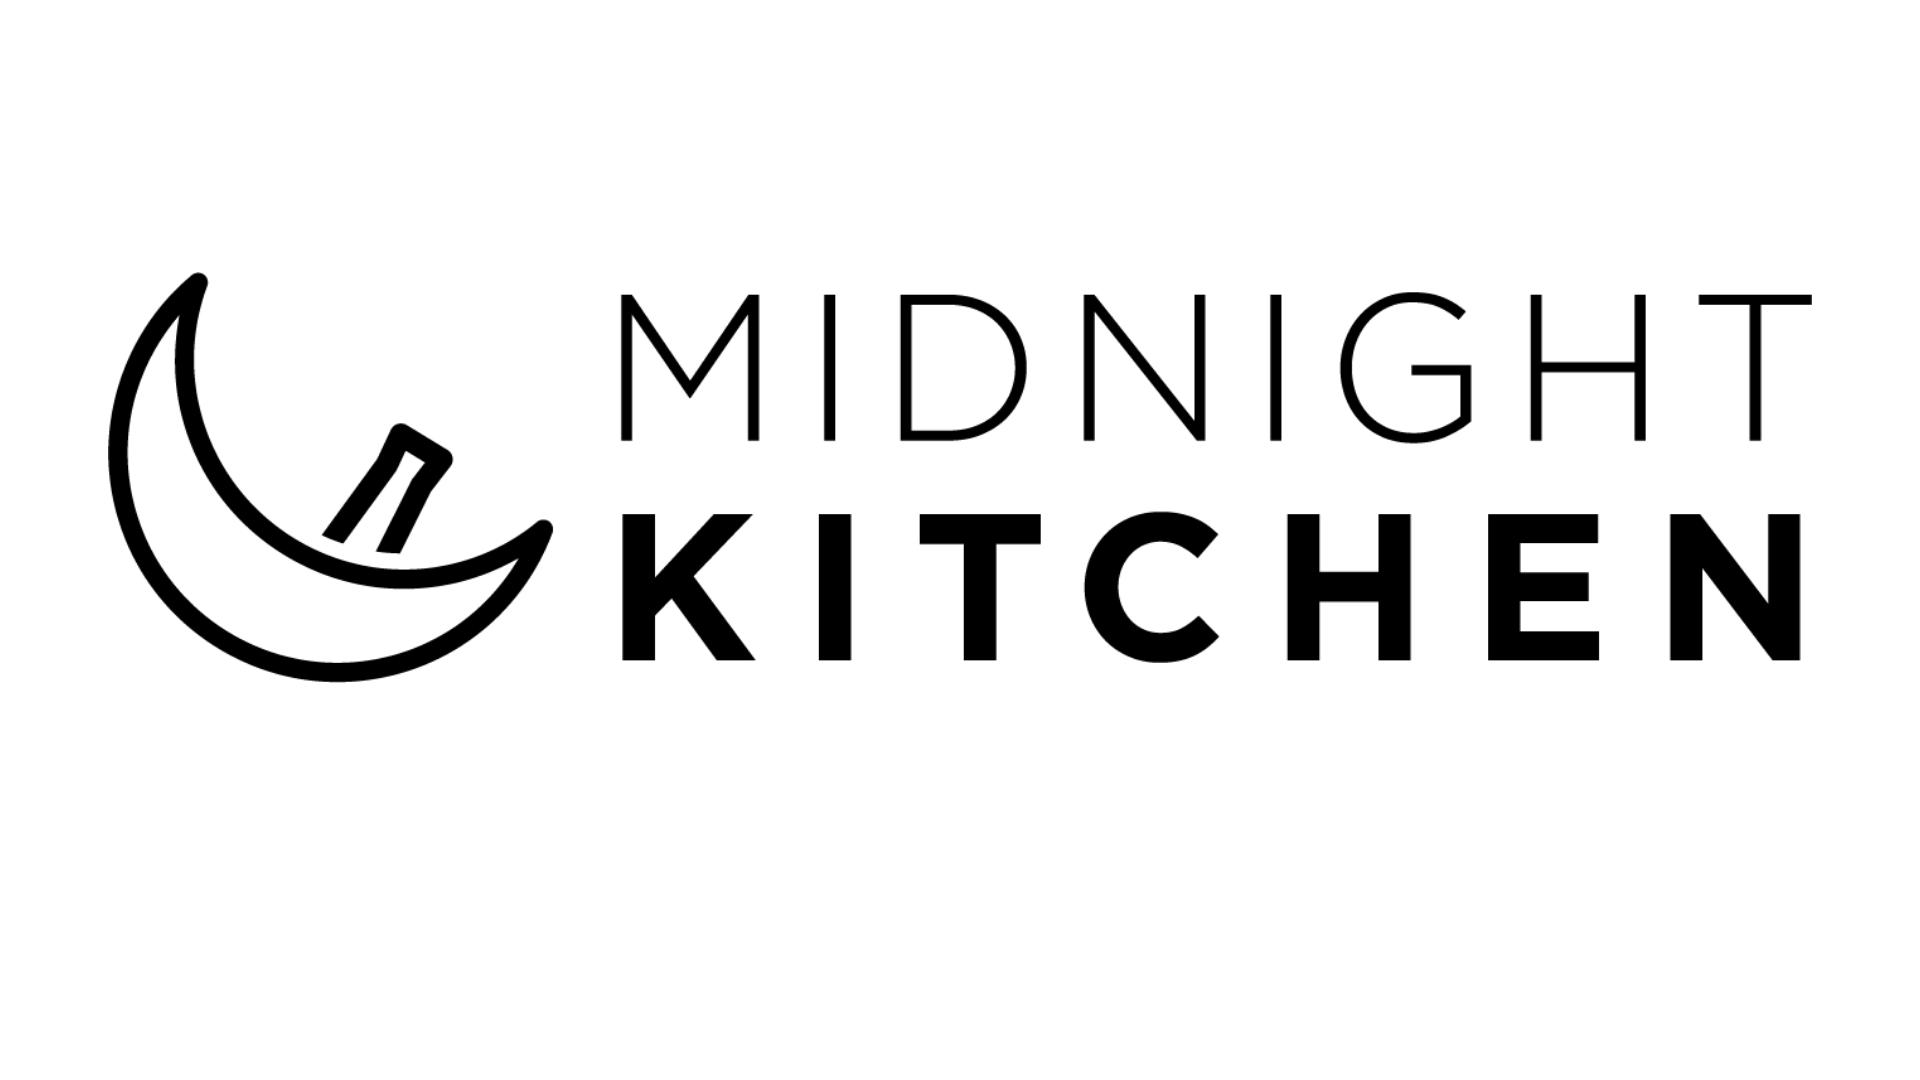 Midnight Kitchen